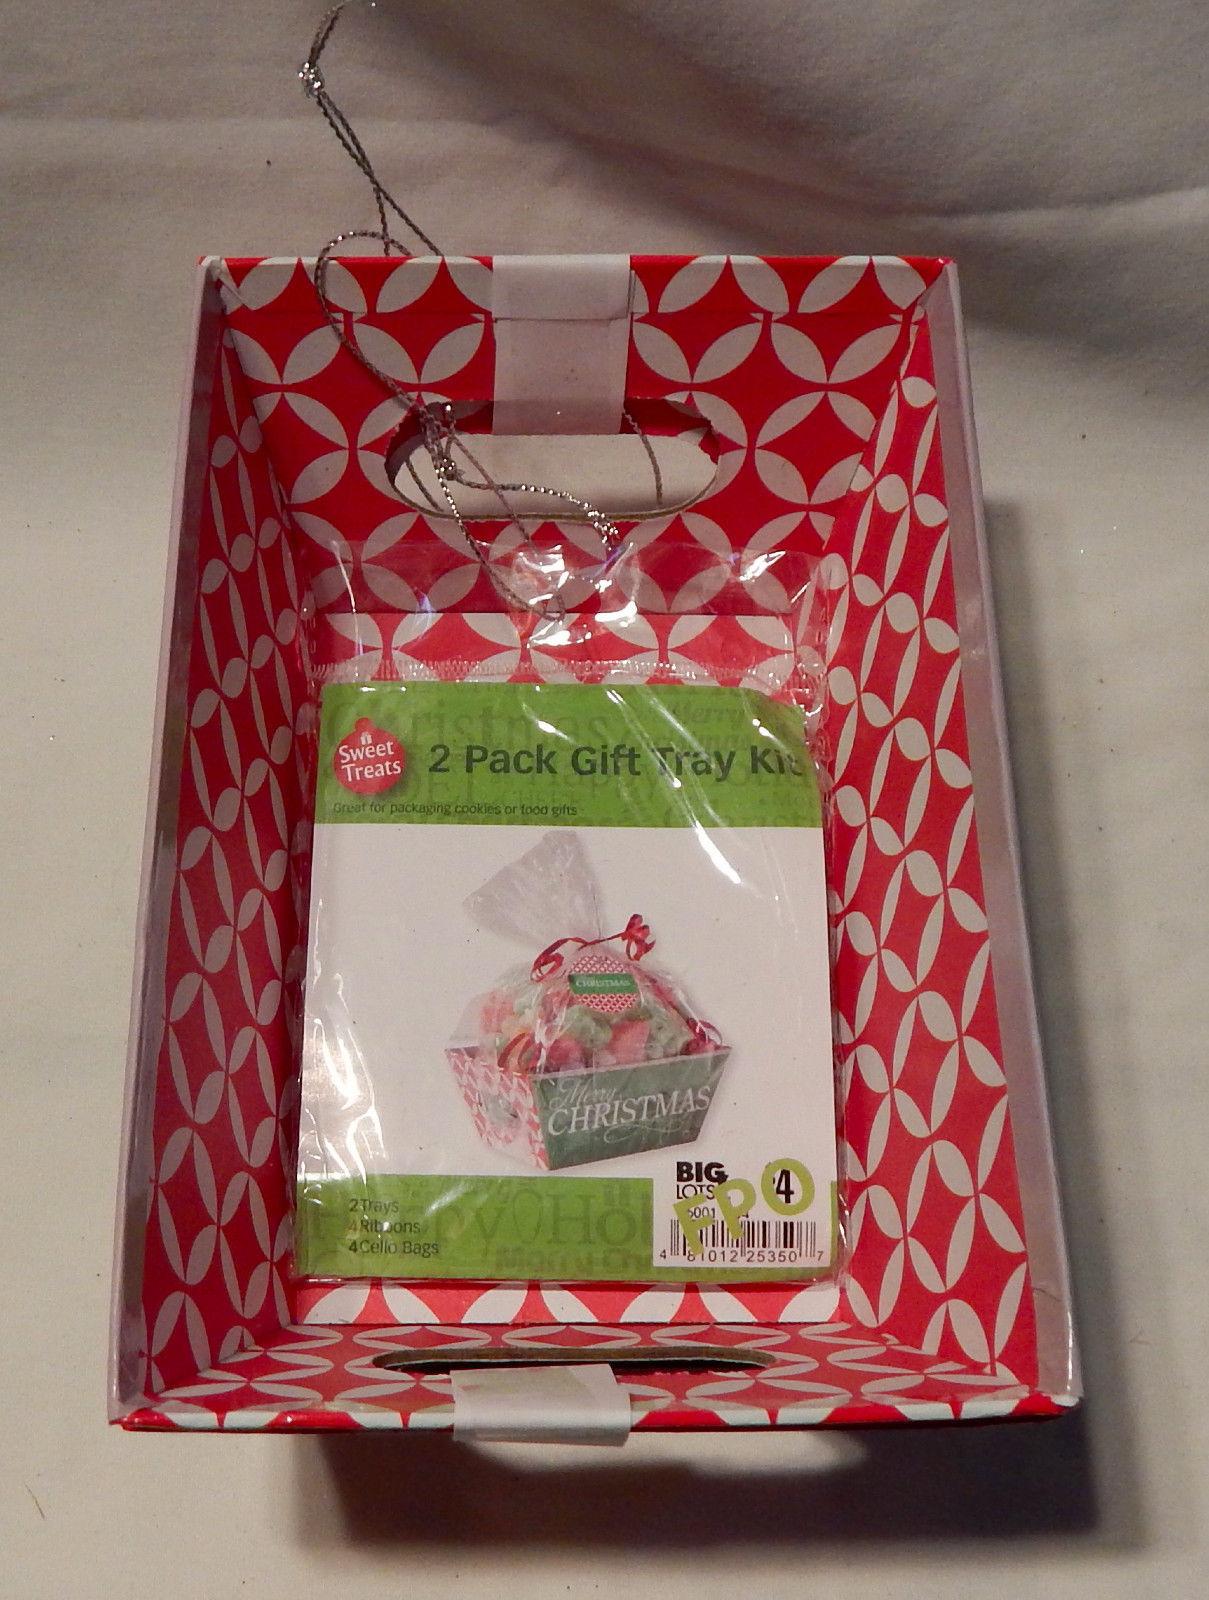 "Christmas 2 Pack Gift Tray Set Sweet Treats Merry Christmas 4 1/2"" x 7"" 23C"